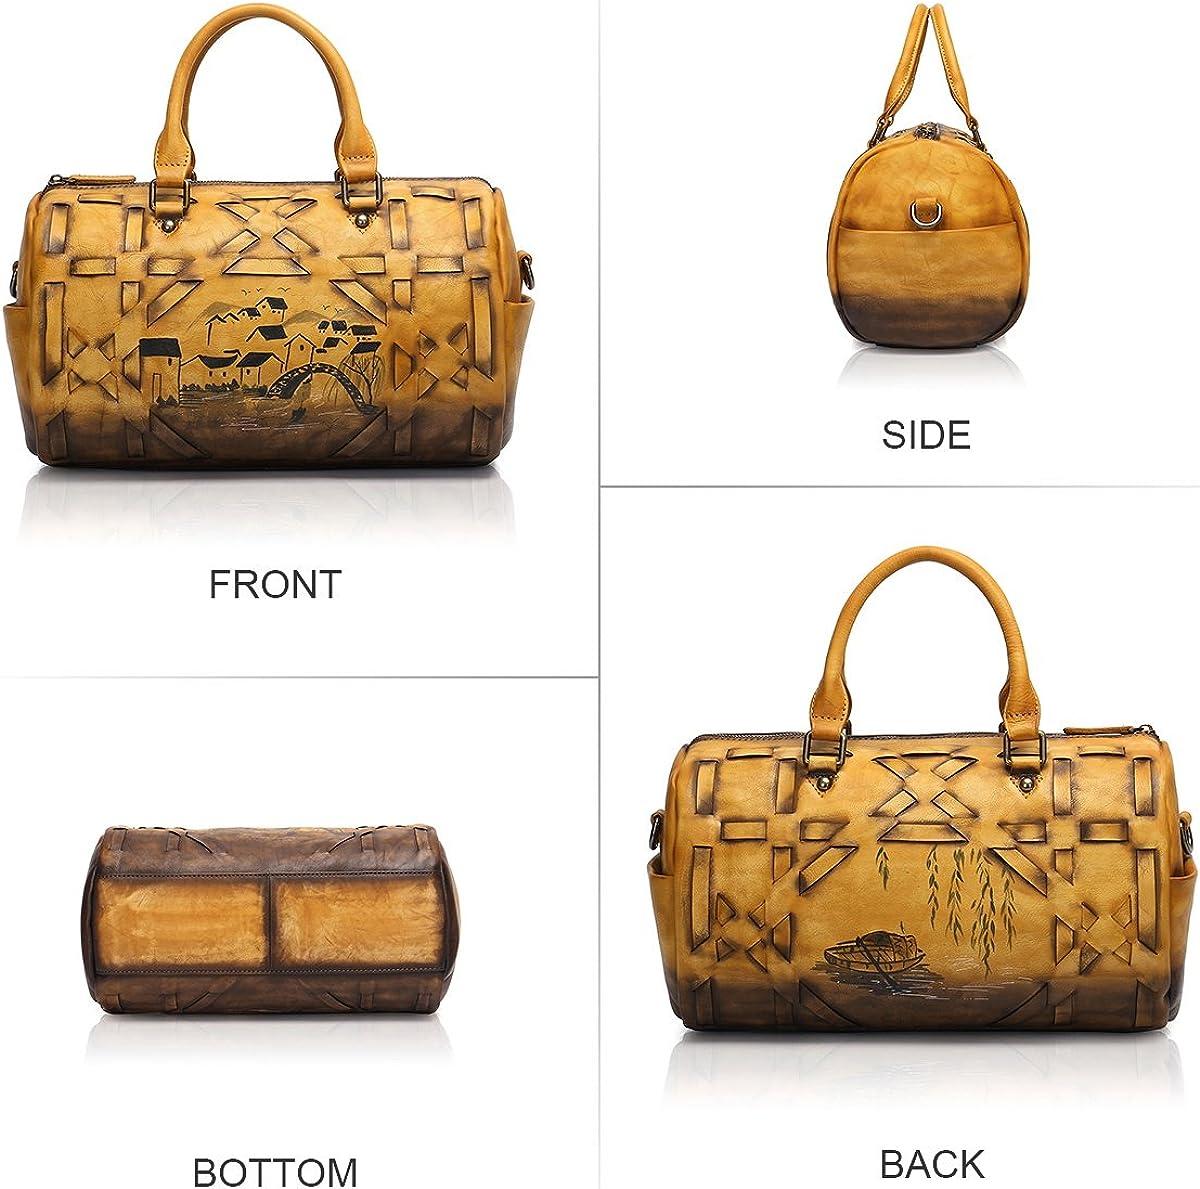 APHISON Designer Soft Leather Totes Handbags for Women Ladies Satchels Shoulder Bags 8145